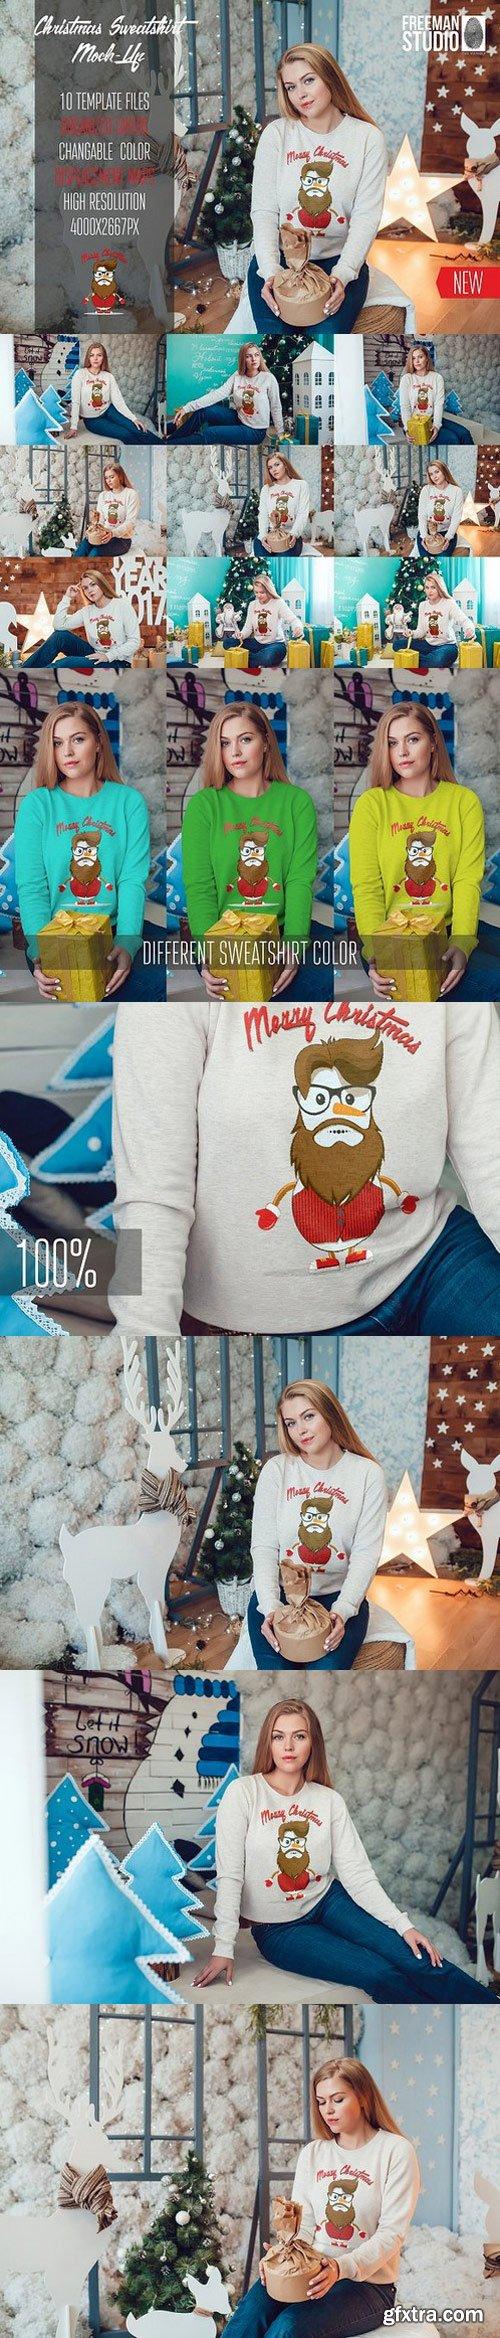 CM - Christmas Sweatshirt Mock-Up Vol.2 1107656